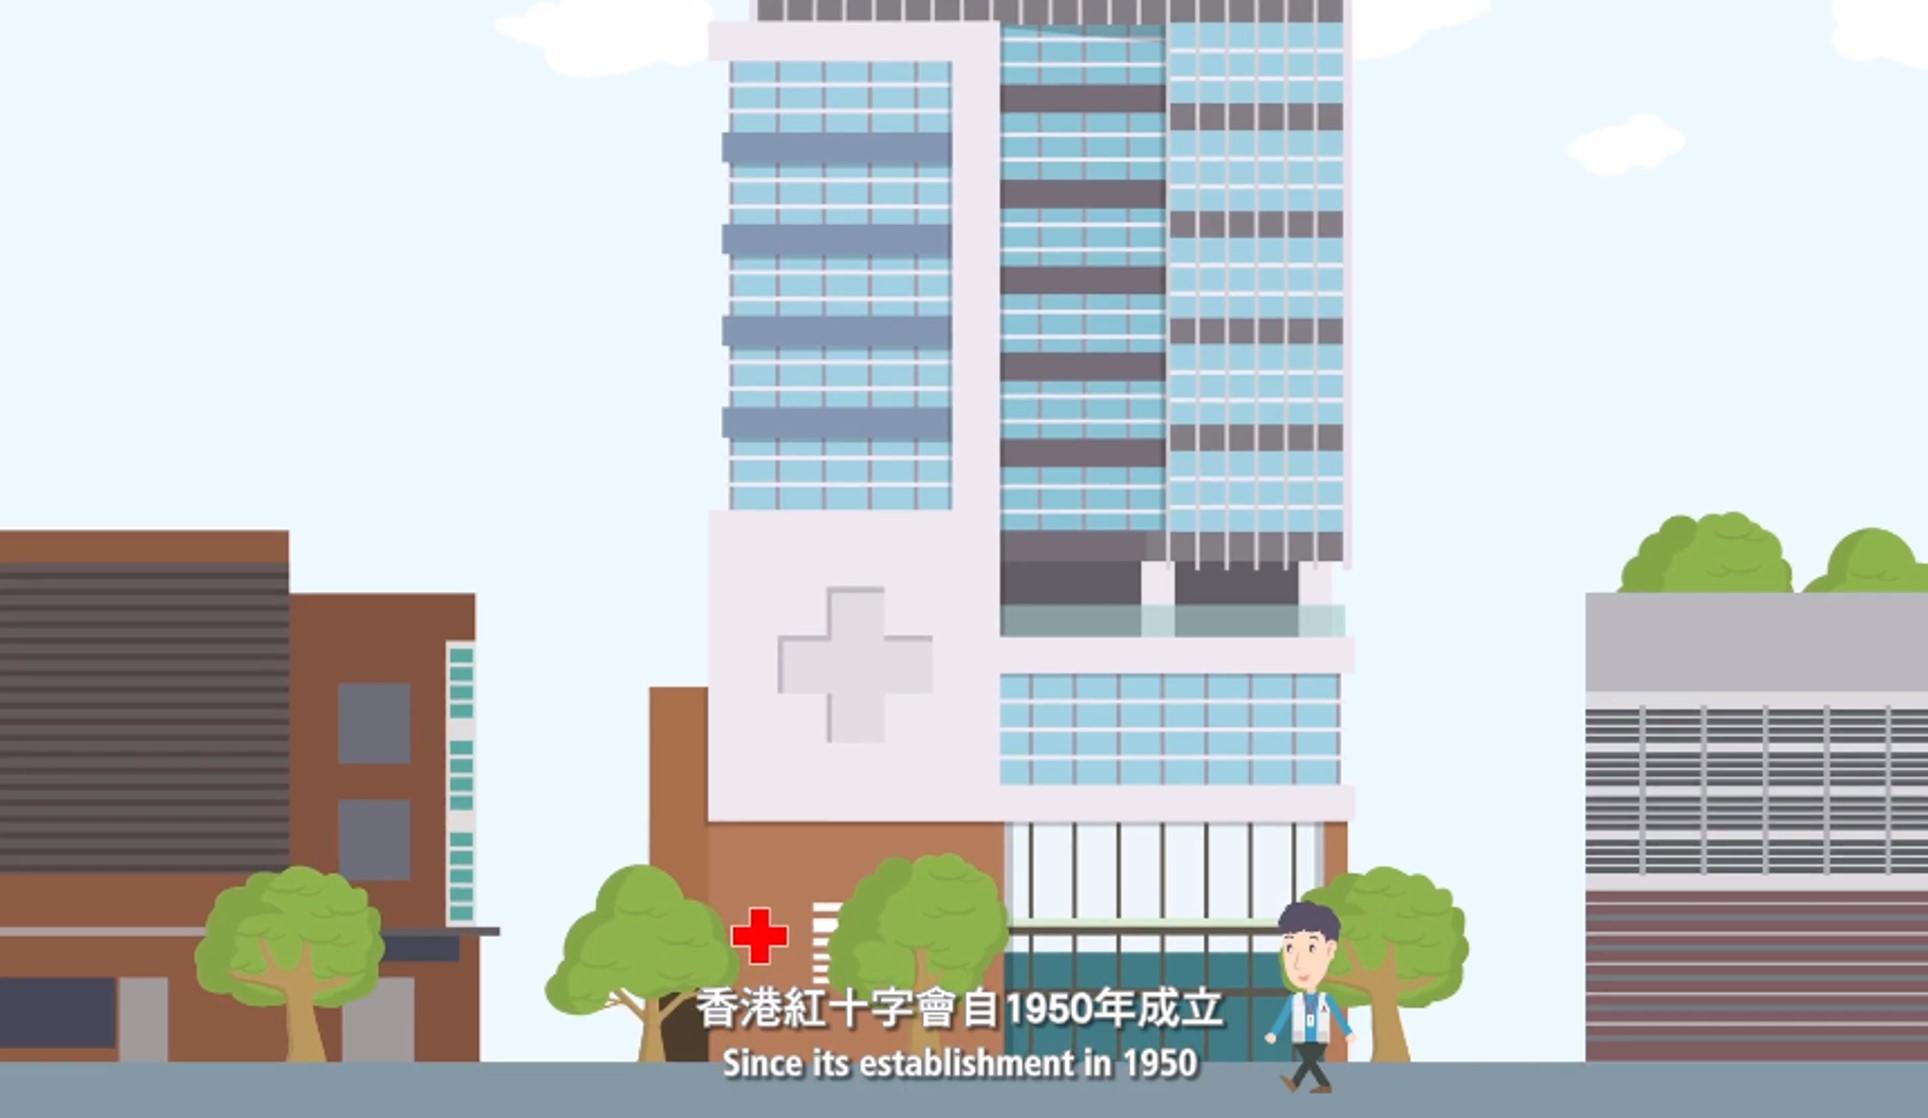 HK Red Cross